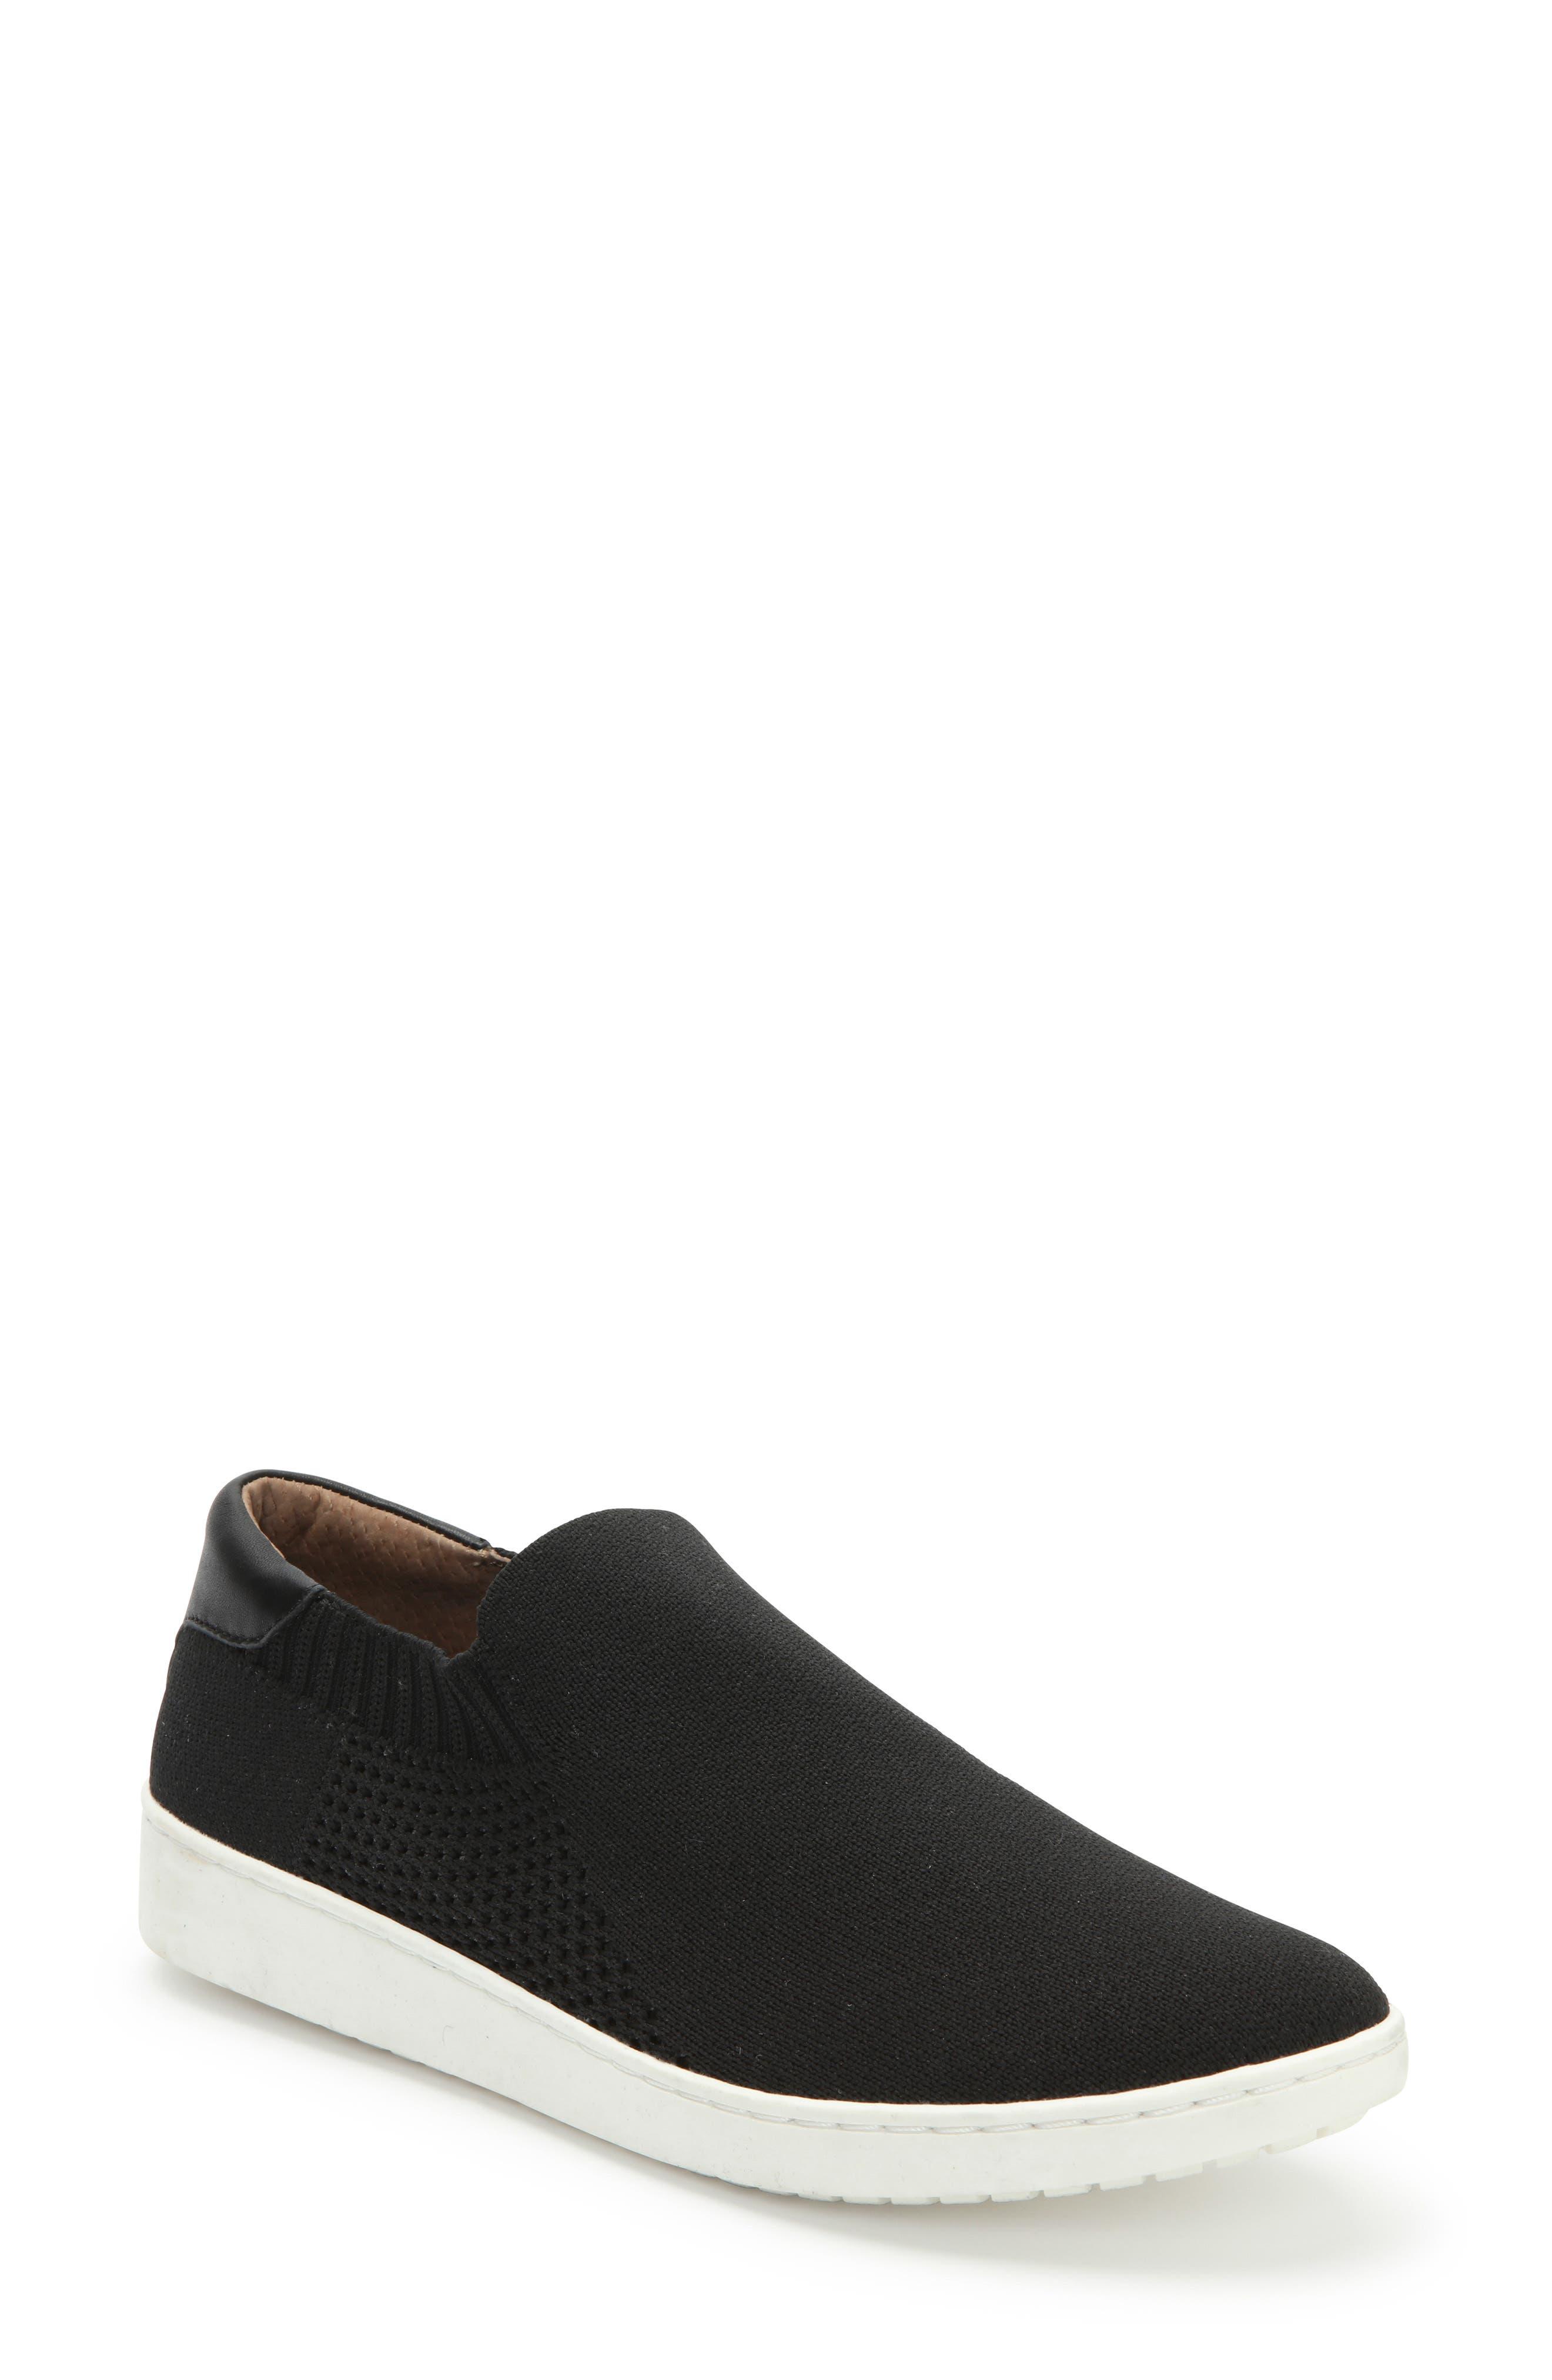 ADAM TUCKER BY ME TOO Adam Tucker Romy Slip-On Sneaker, Main, color, BLACK FABRIC